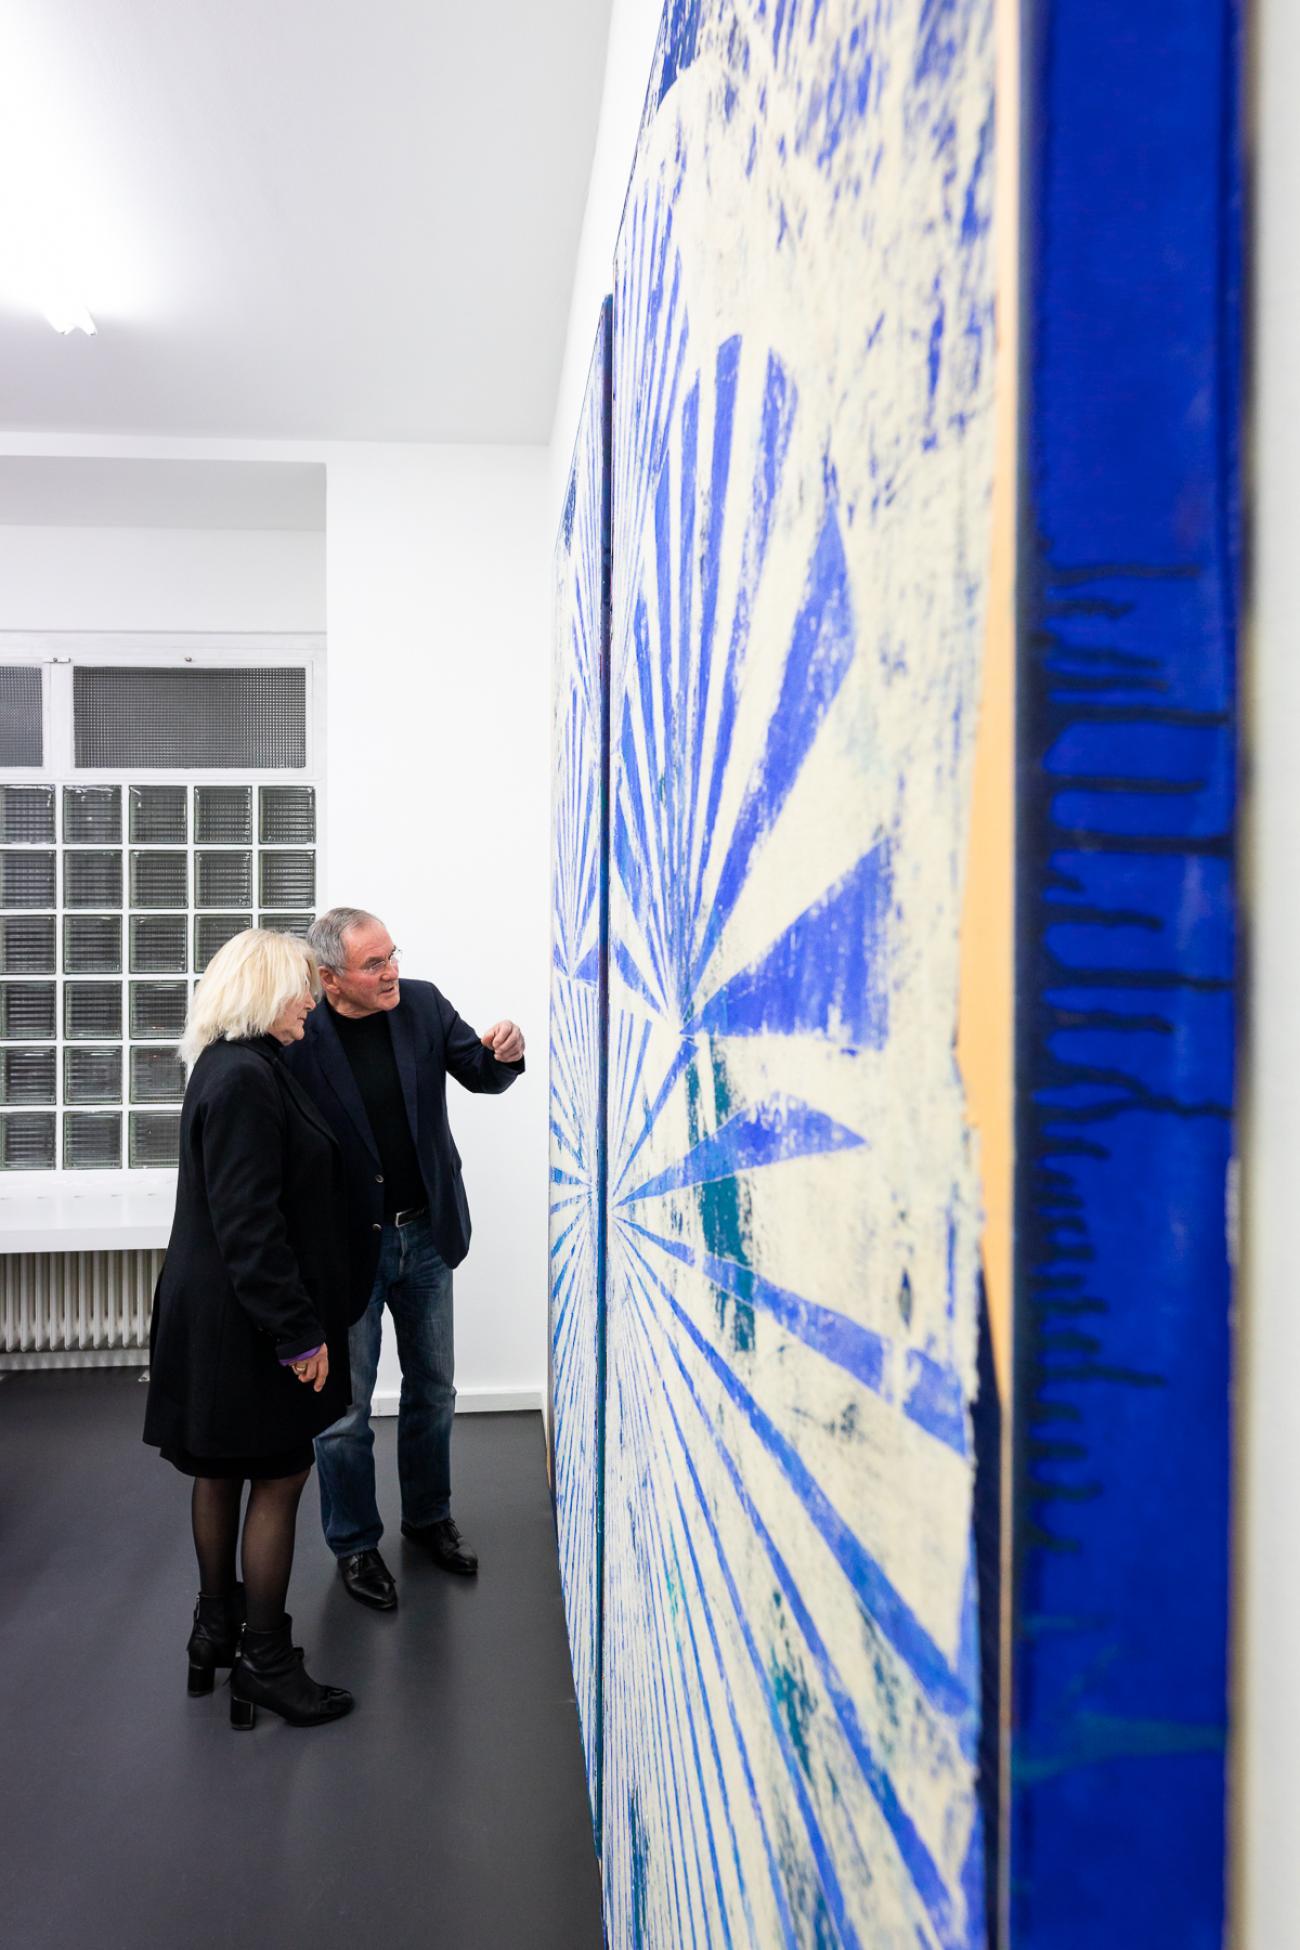 75 VBKI Galeriendinner Schwarz Contemporary BF Inga Haar web?itok=9h1eKA1v